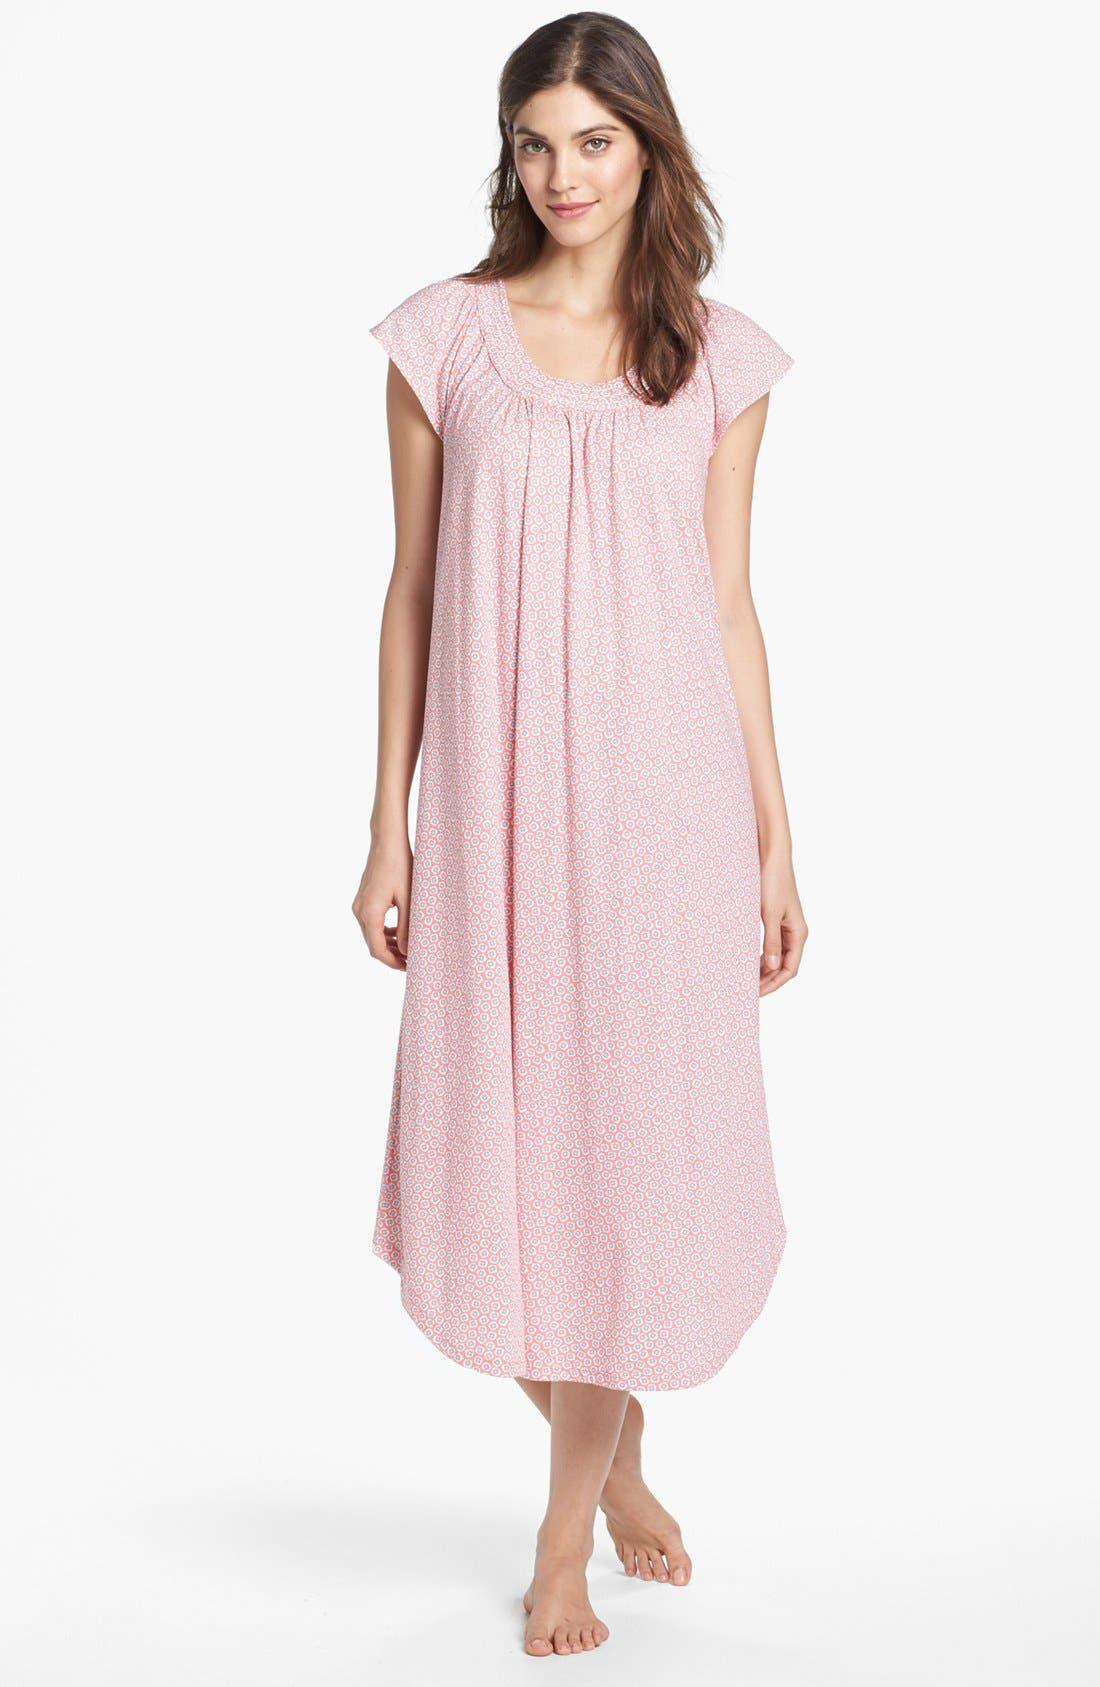 Alternate Image 1 Selected - Carole Hochman Designs 'Garden Delights' Nightgown